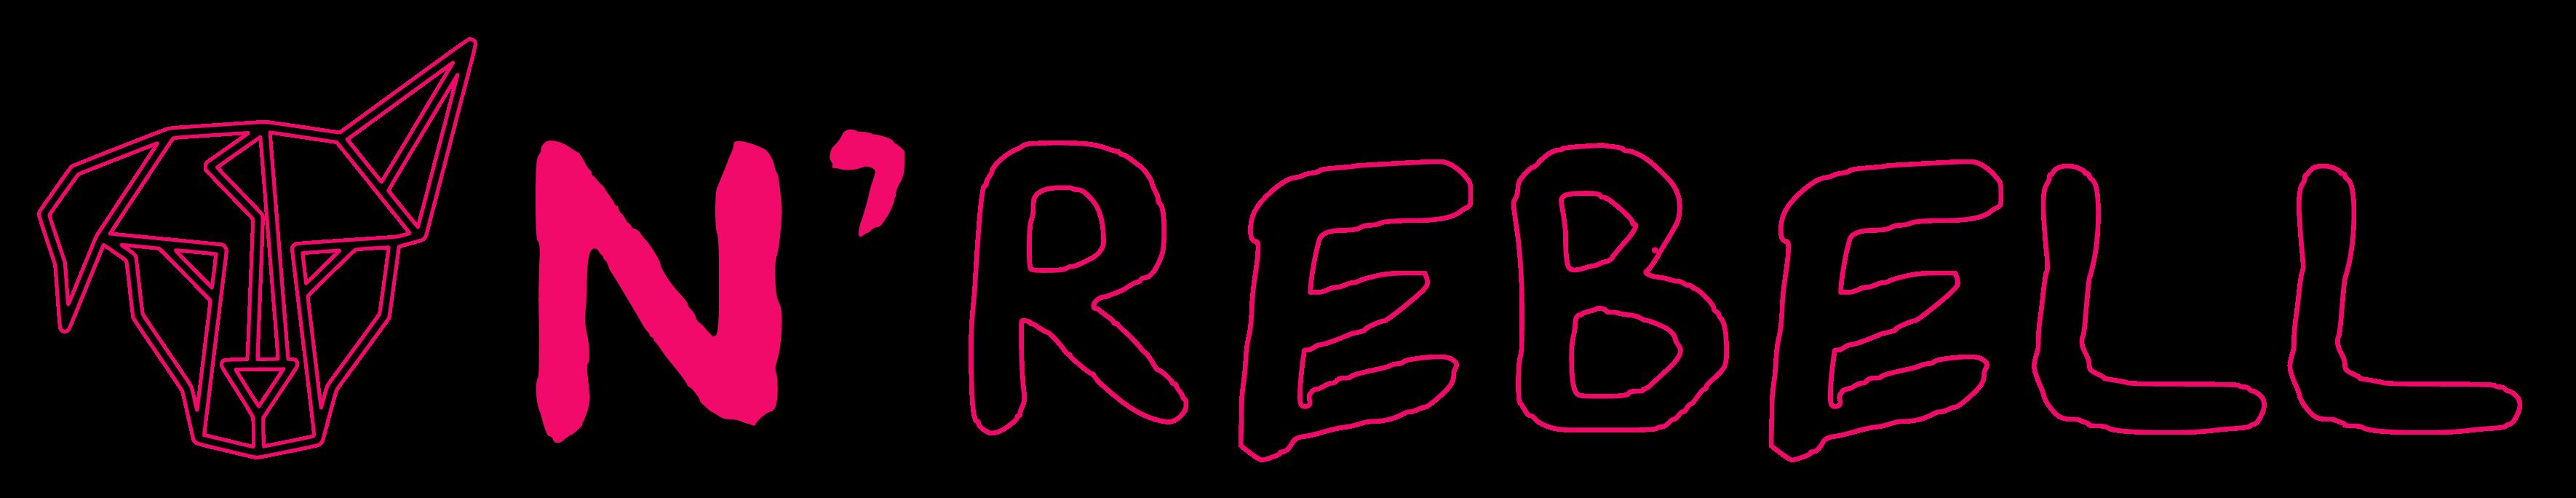 Nias Rebell